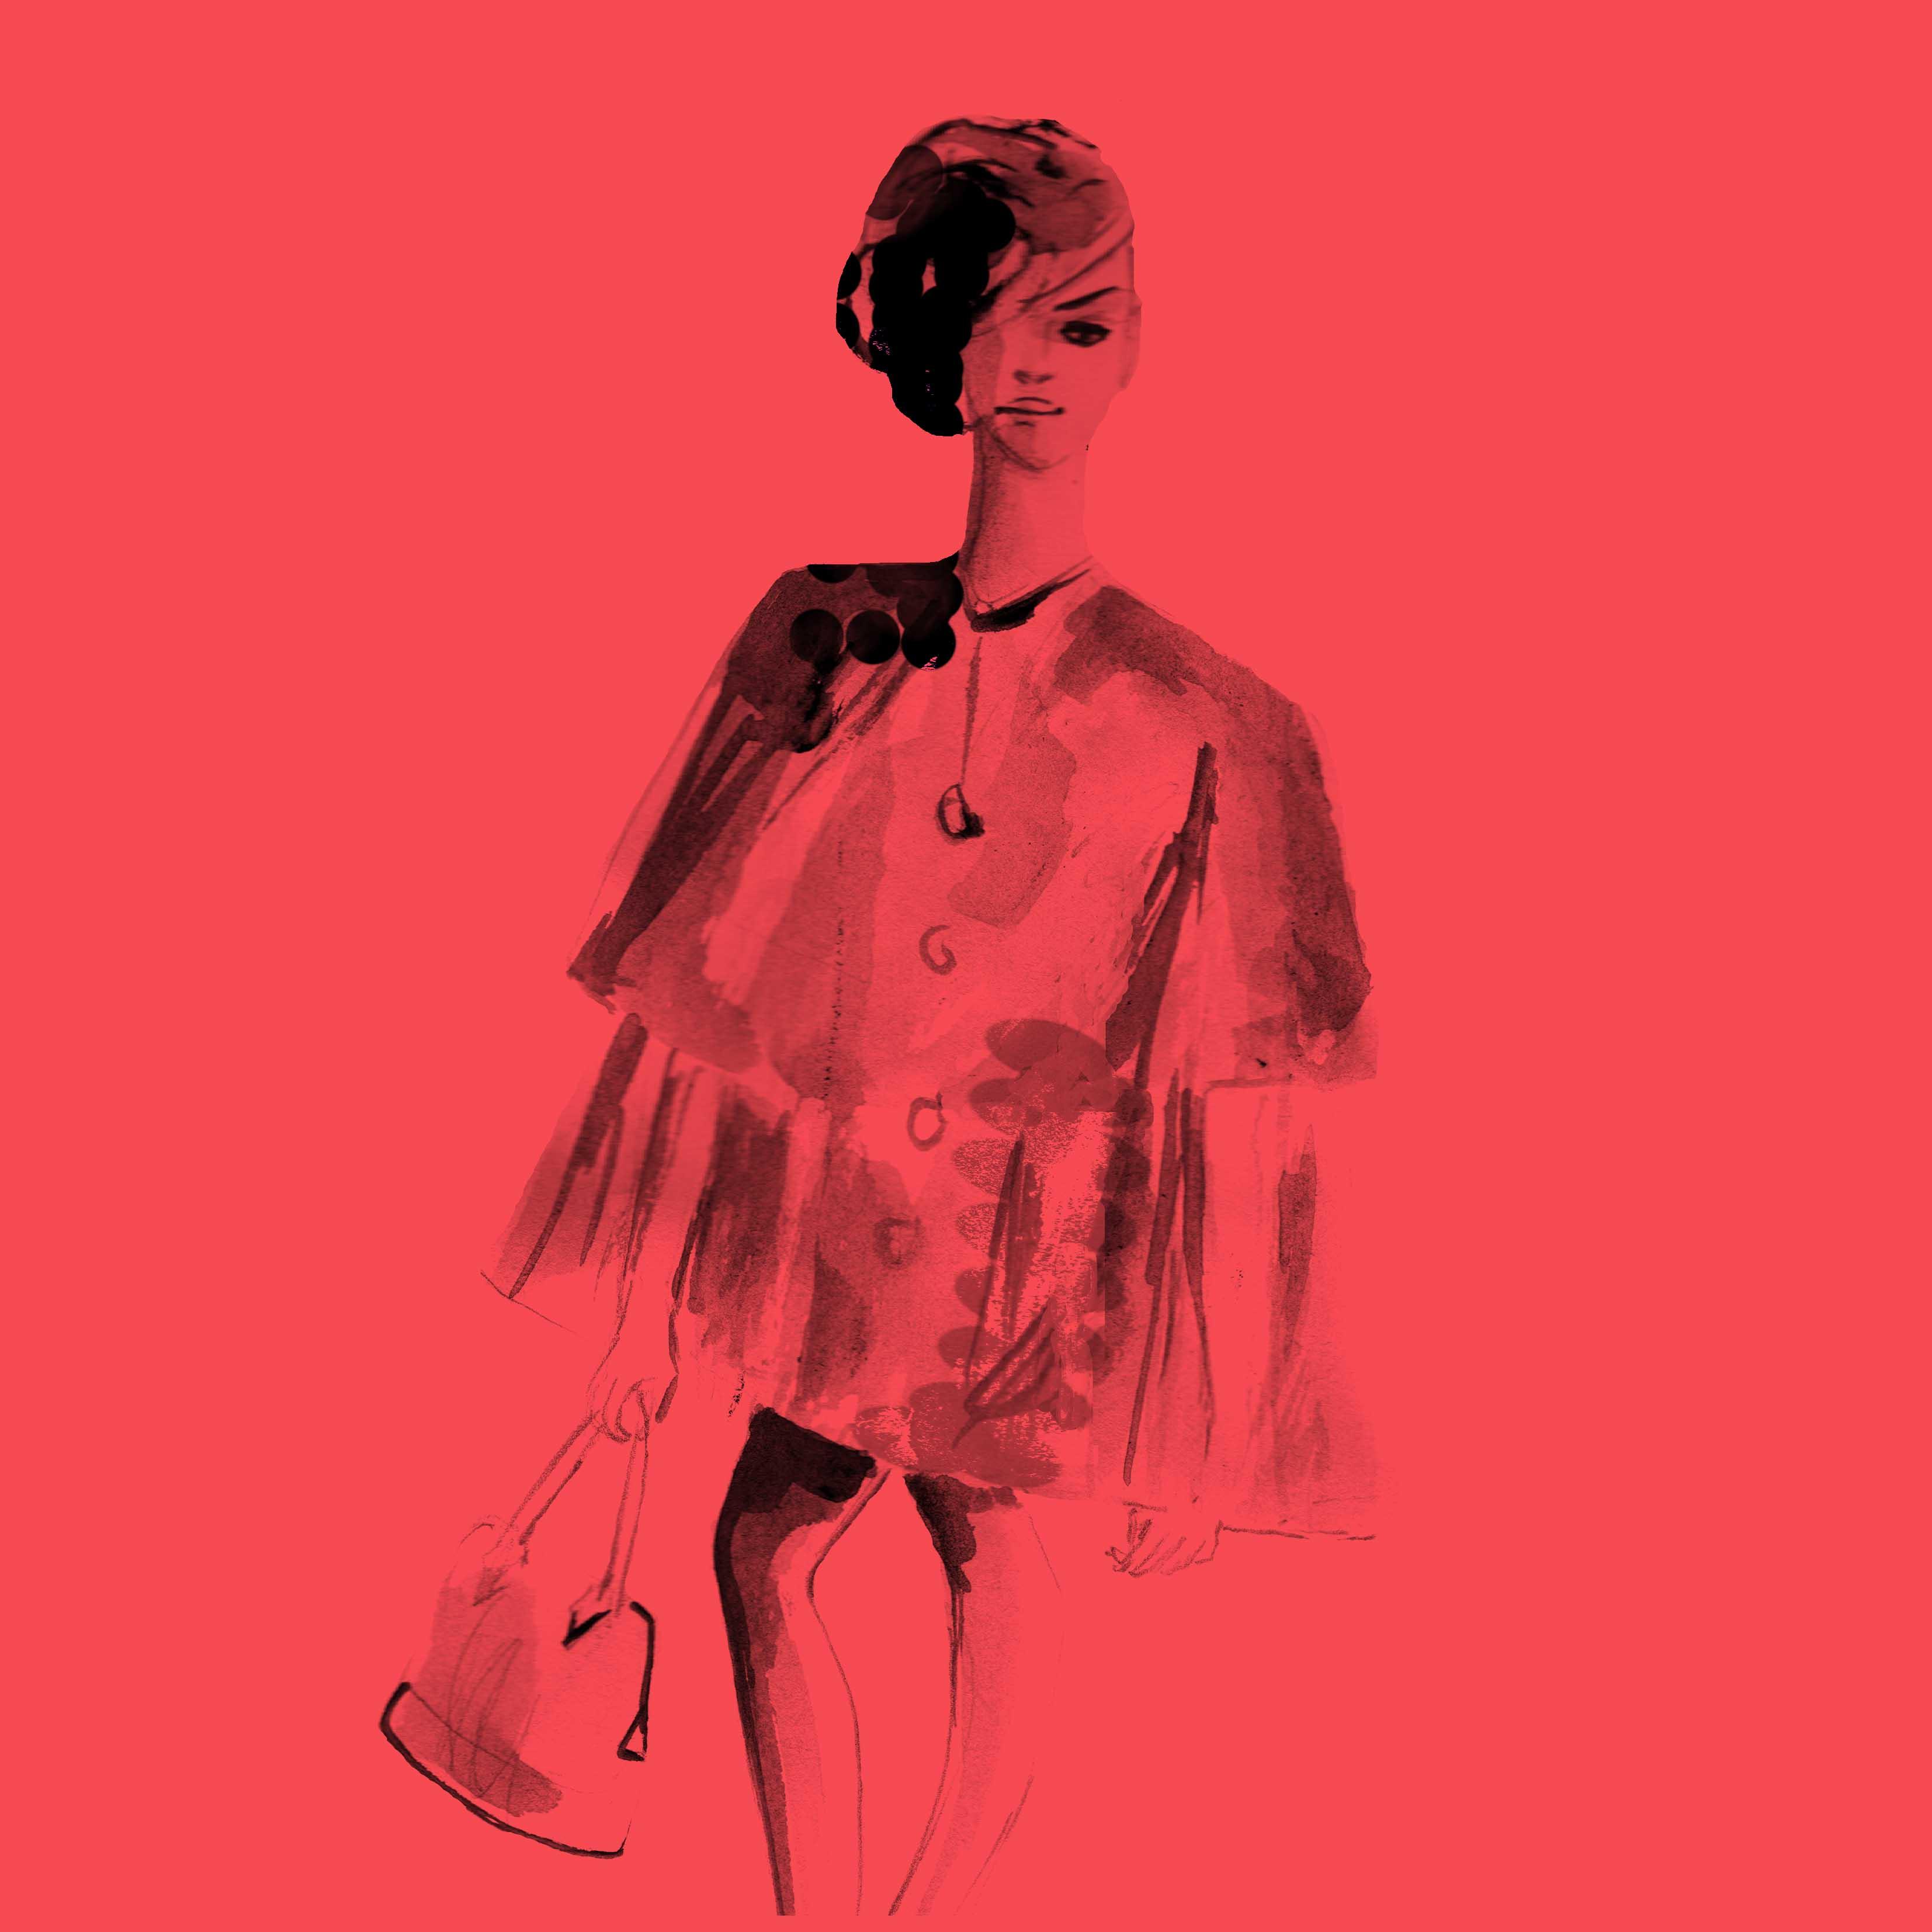 fashion-illustration-scandinavia-susanneriber